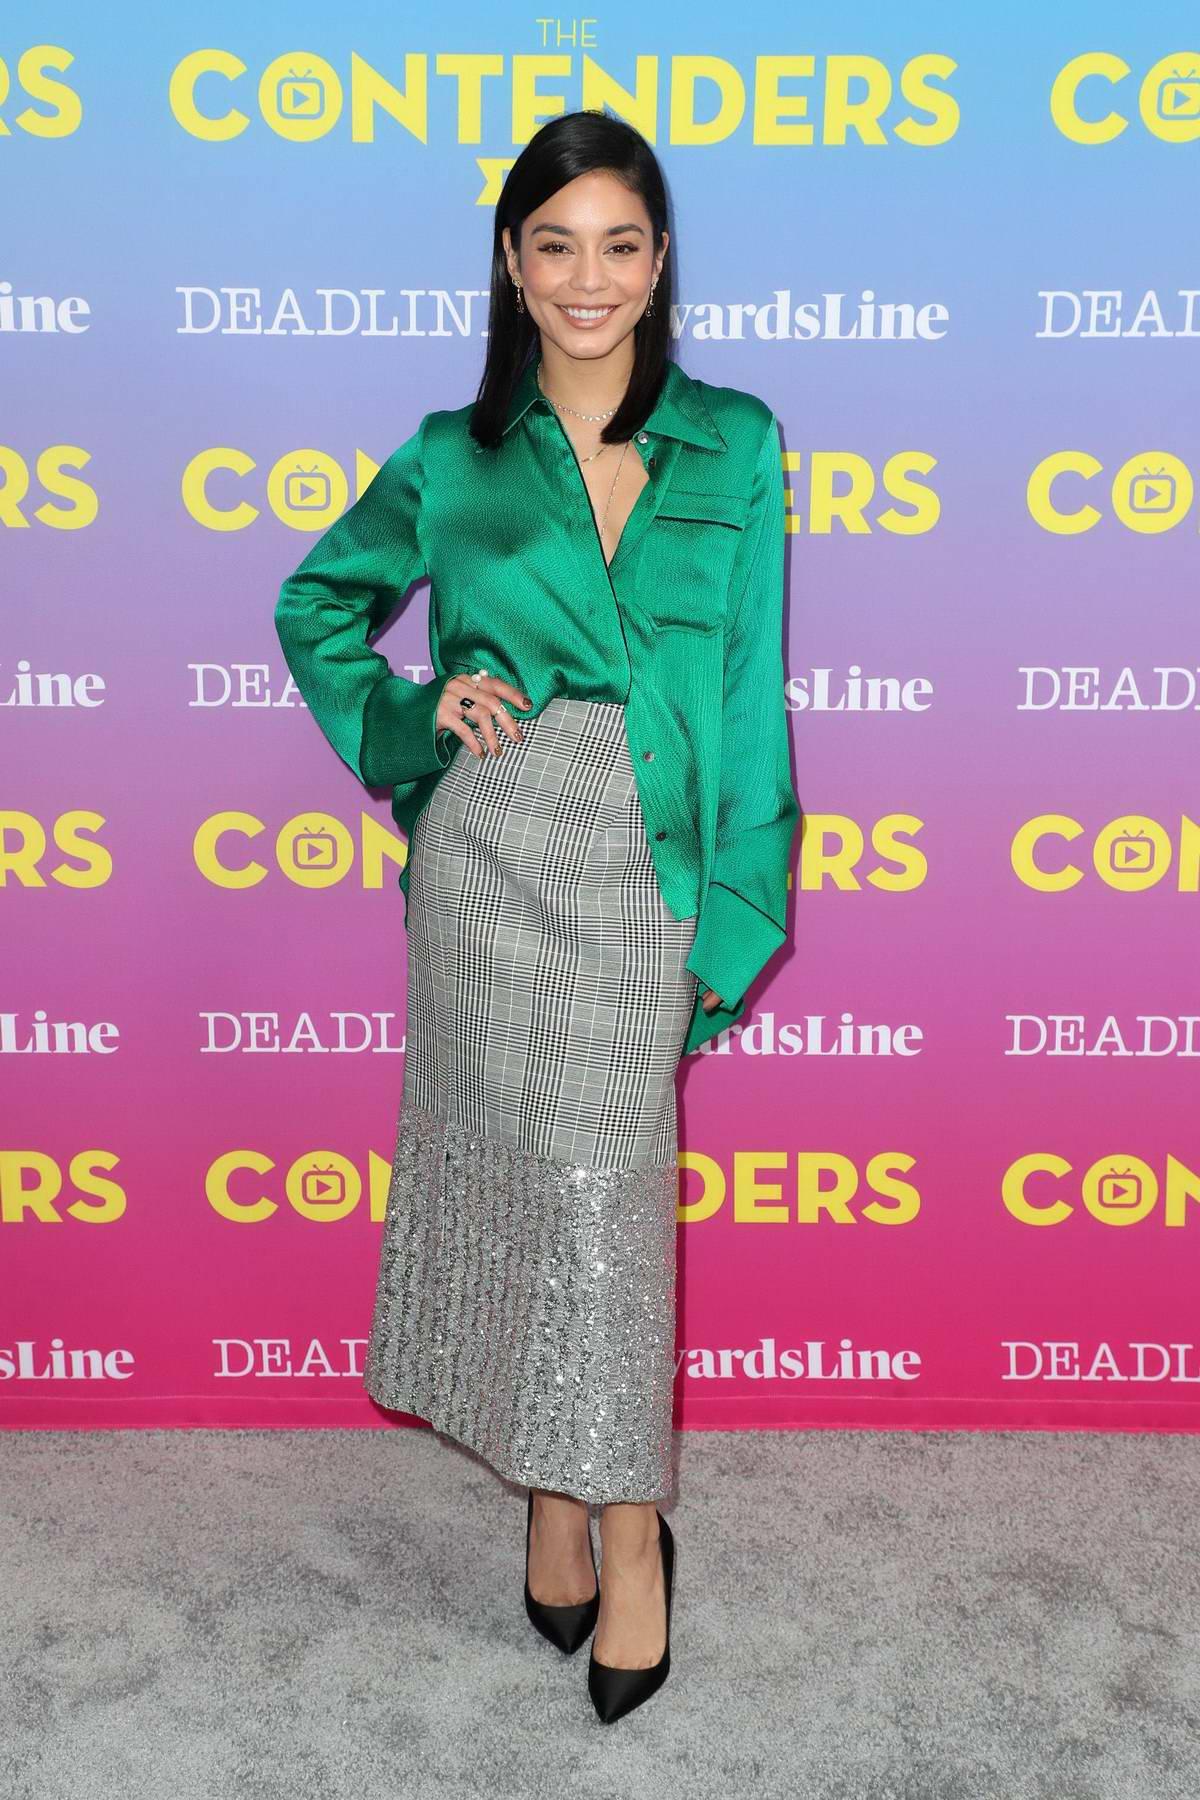 Vanessa Hudgens attends Deadline Contenders Emmy Event Panels in Los Angeles